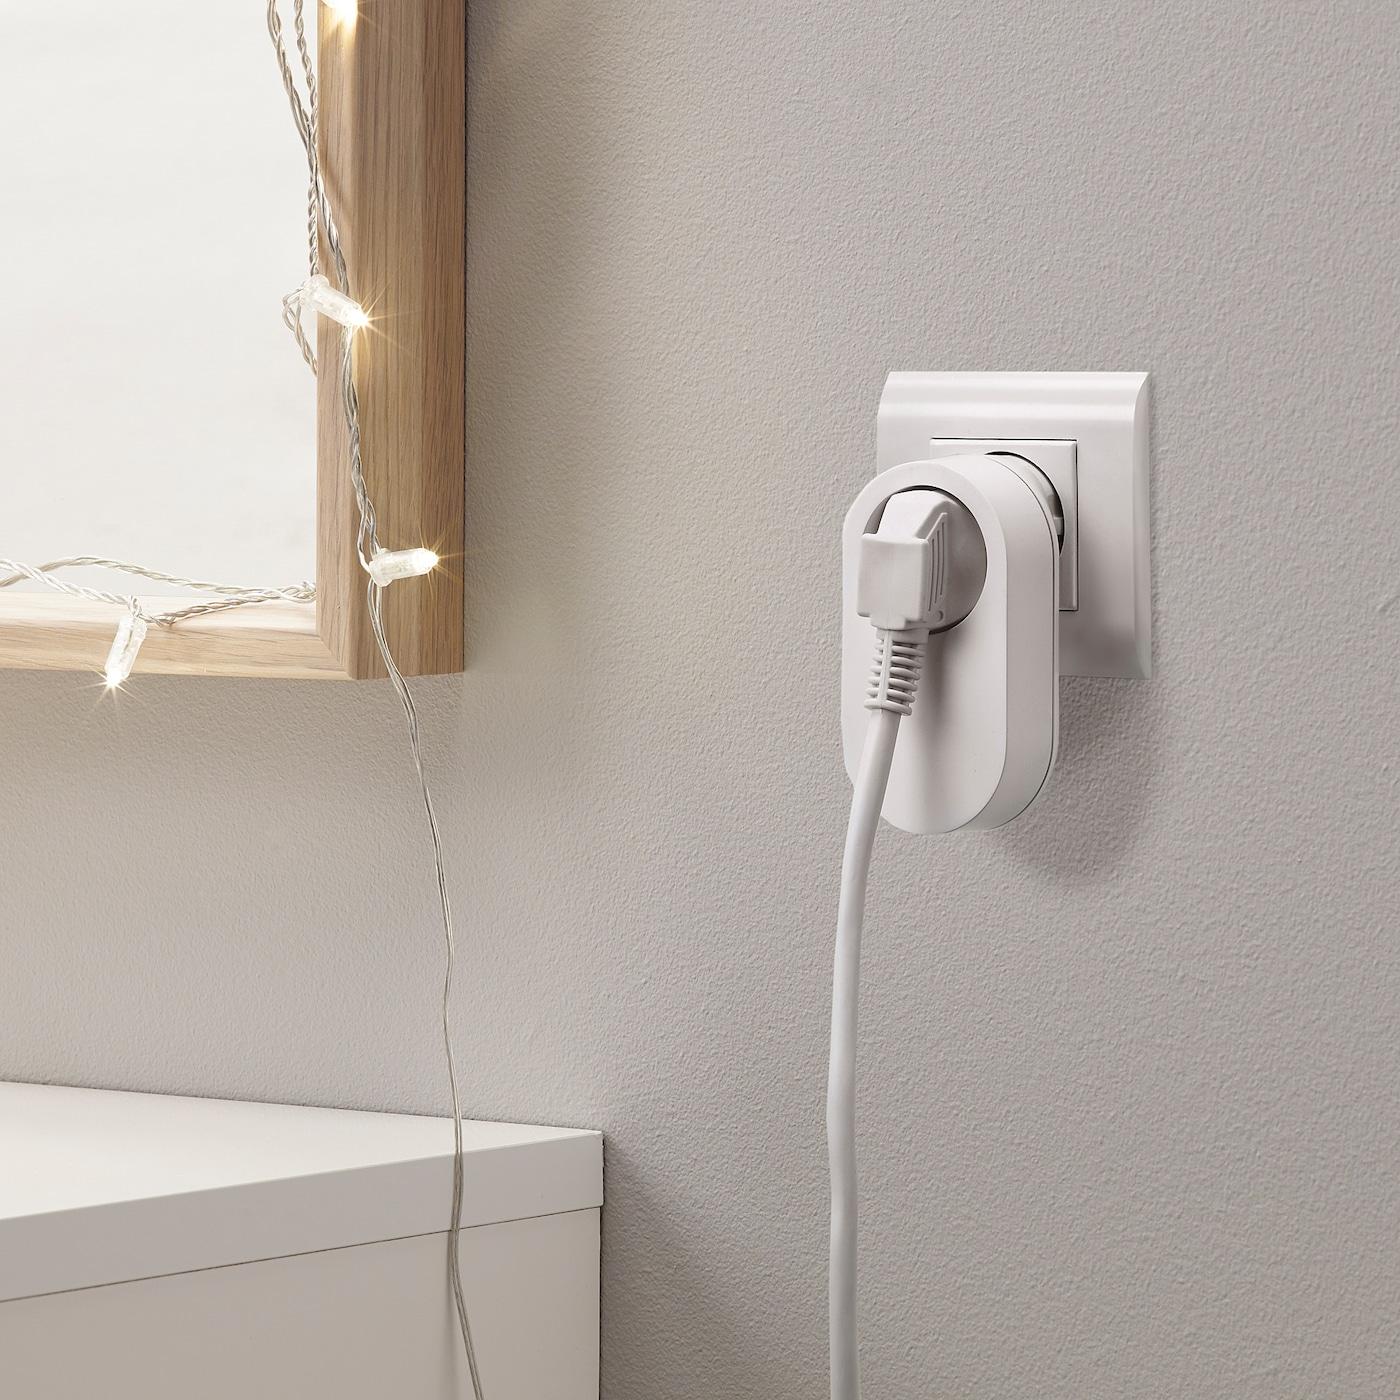 Tradfri Prise Connectee Ikea